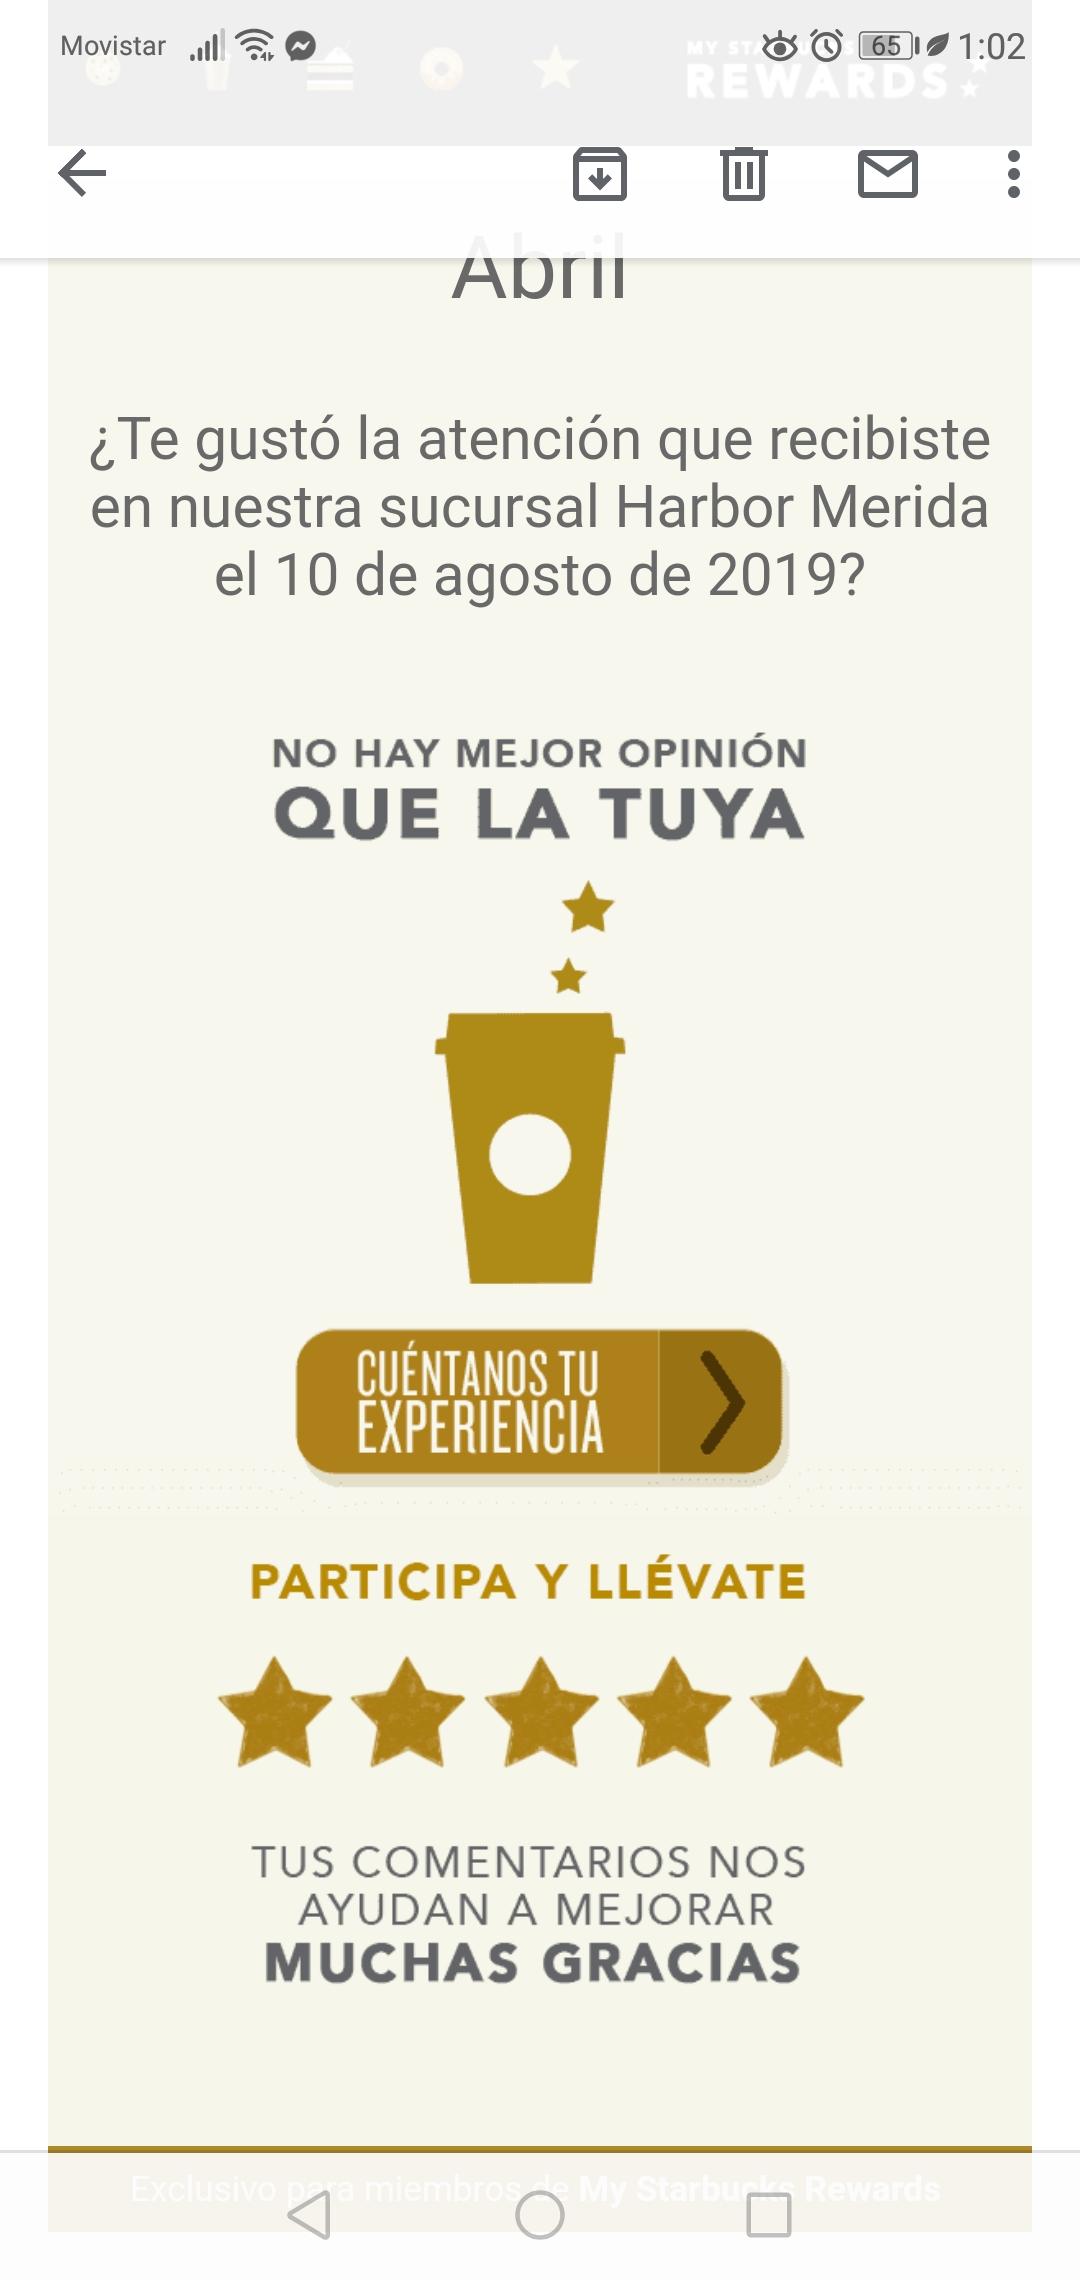 Starbucks: Contesta encuesta y recibe 5 stars